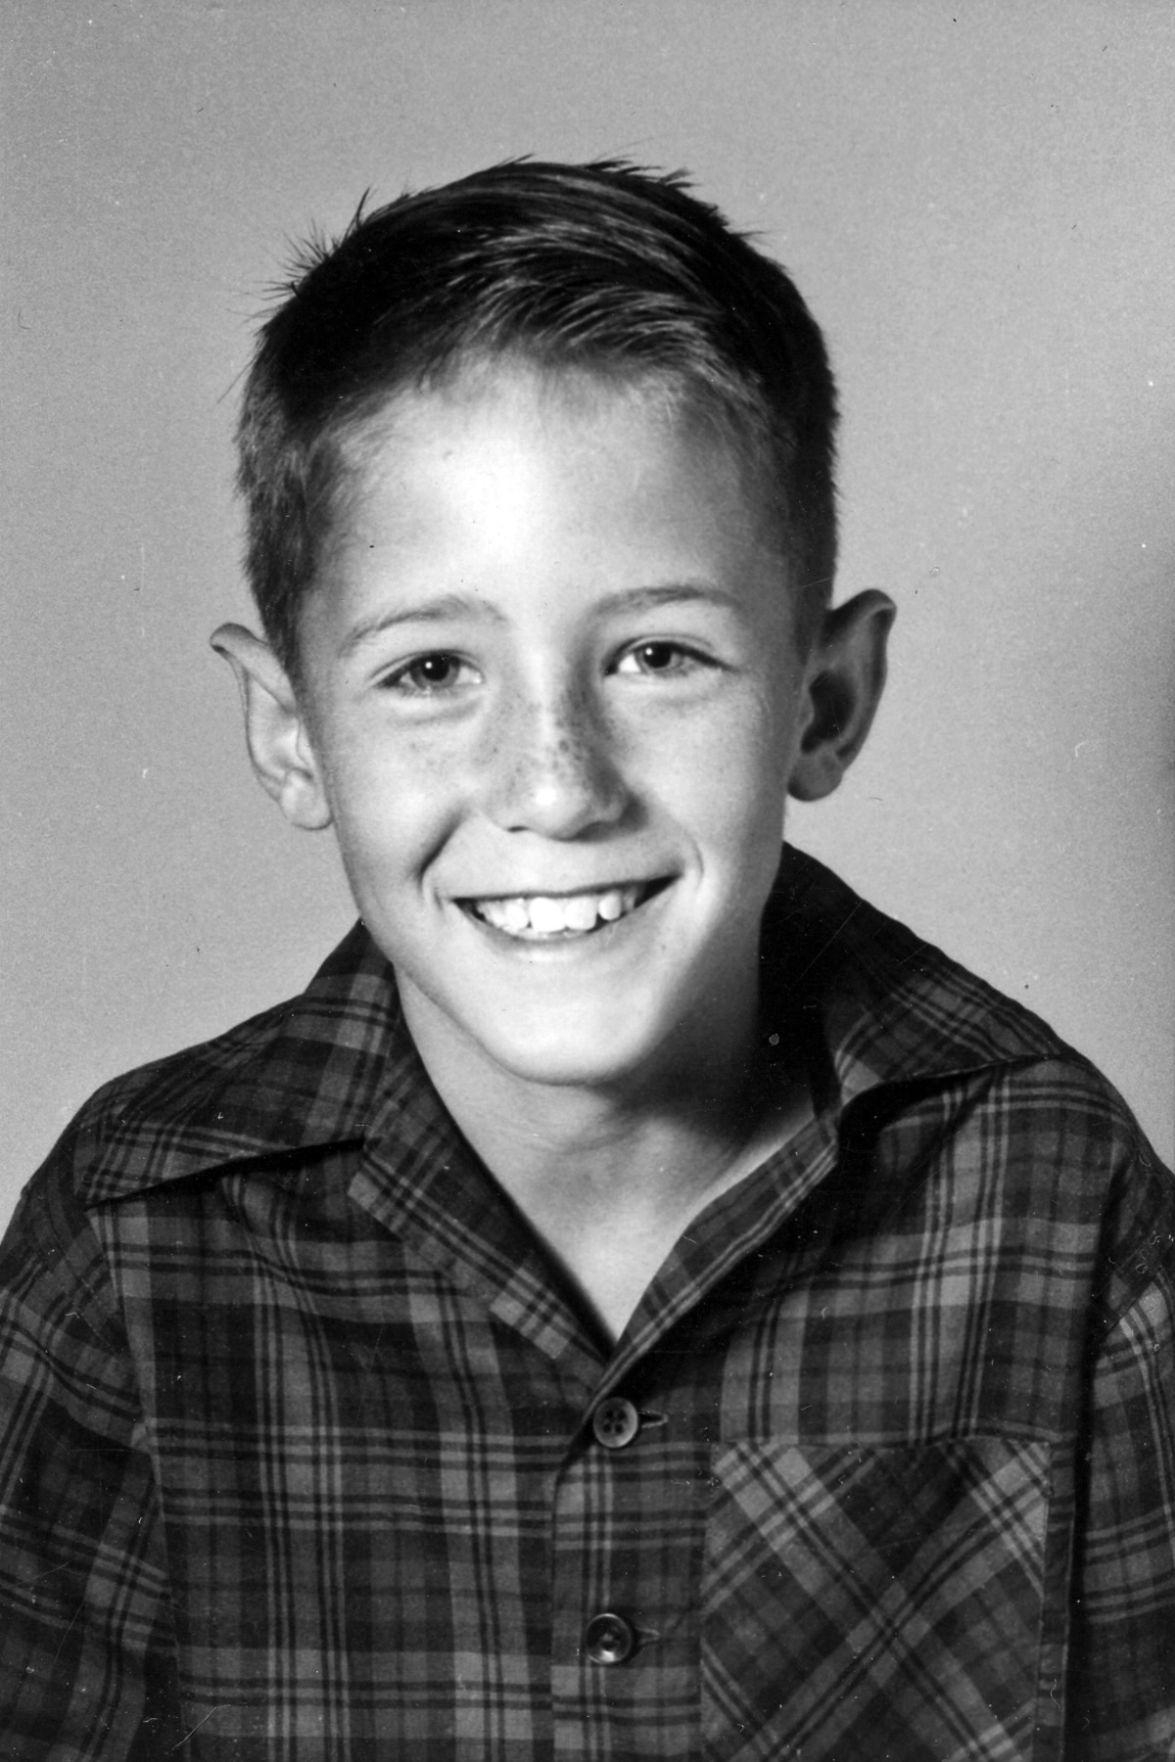 Young Eddie Park